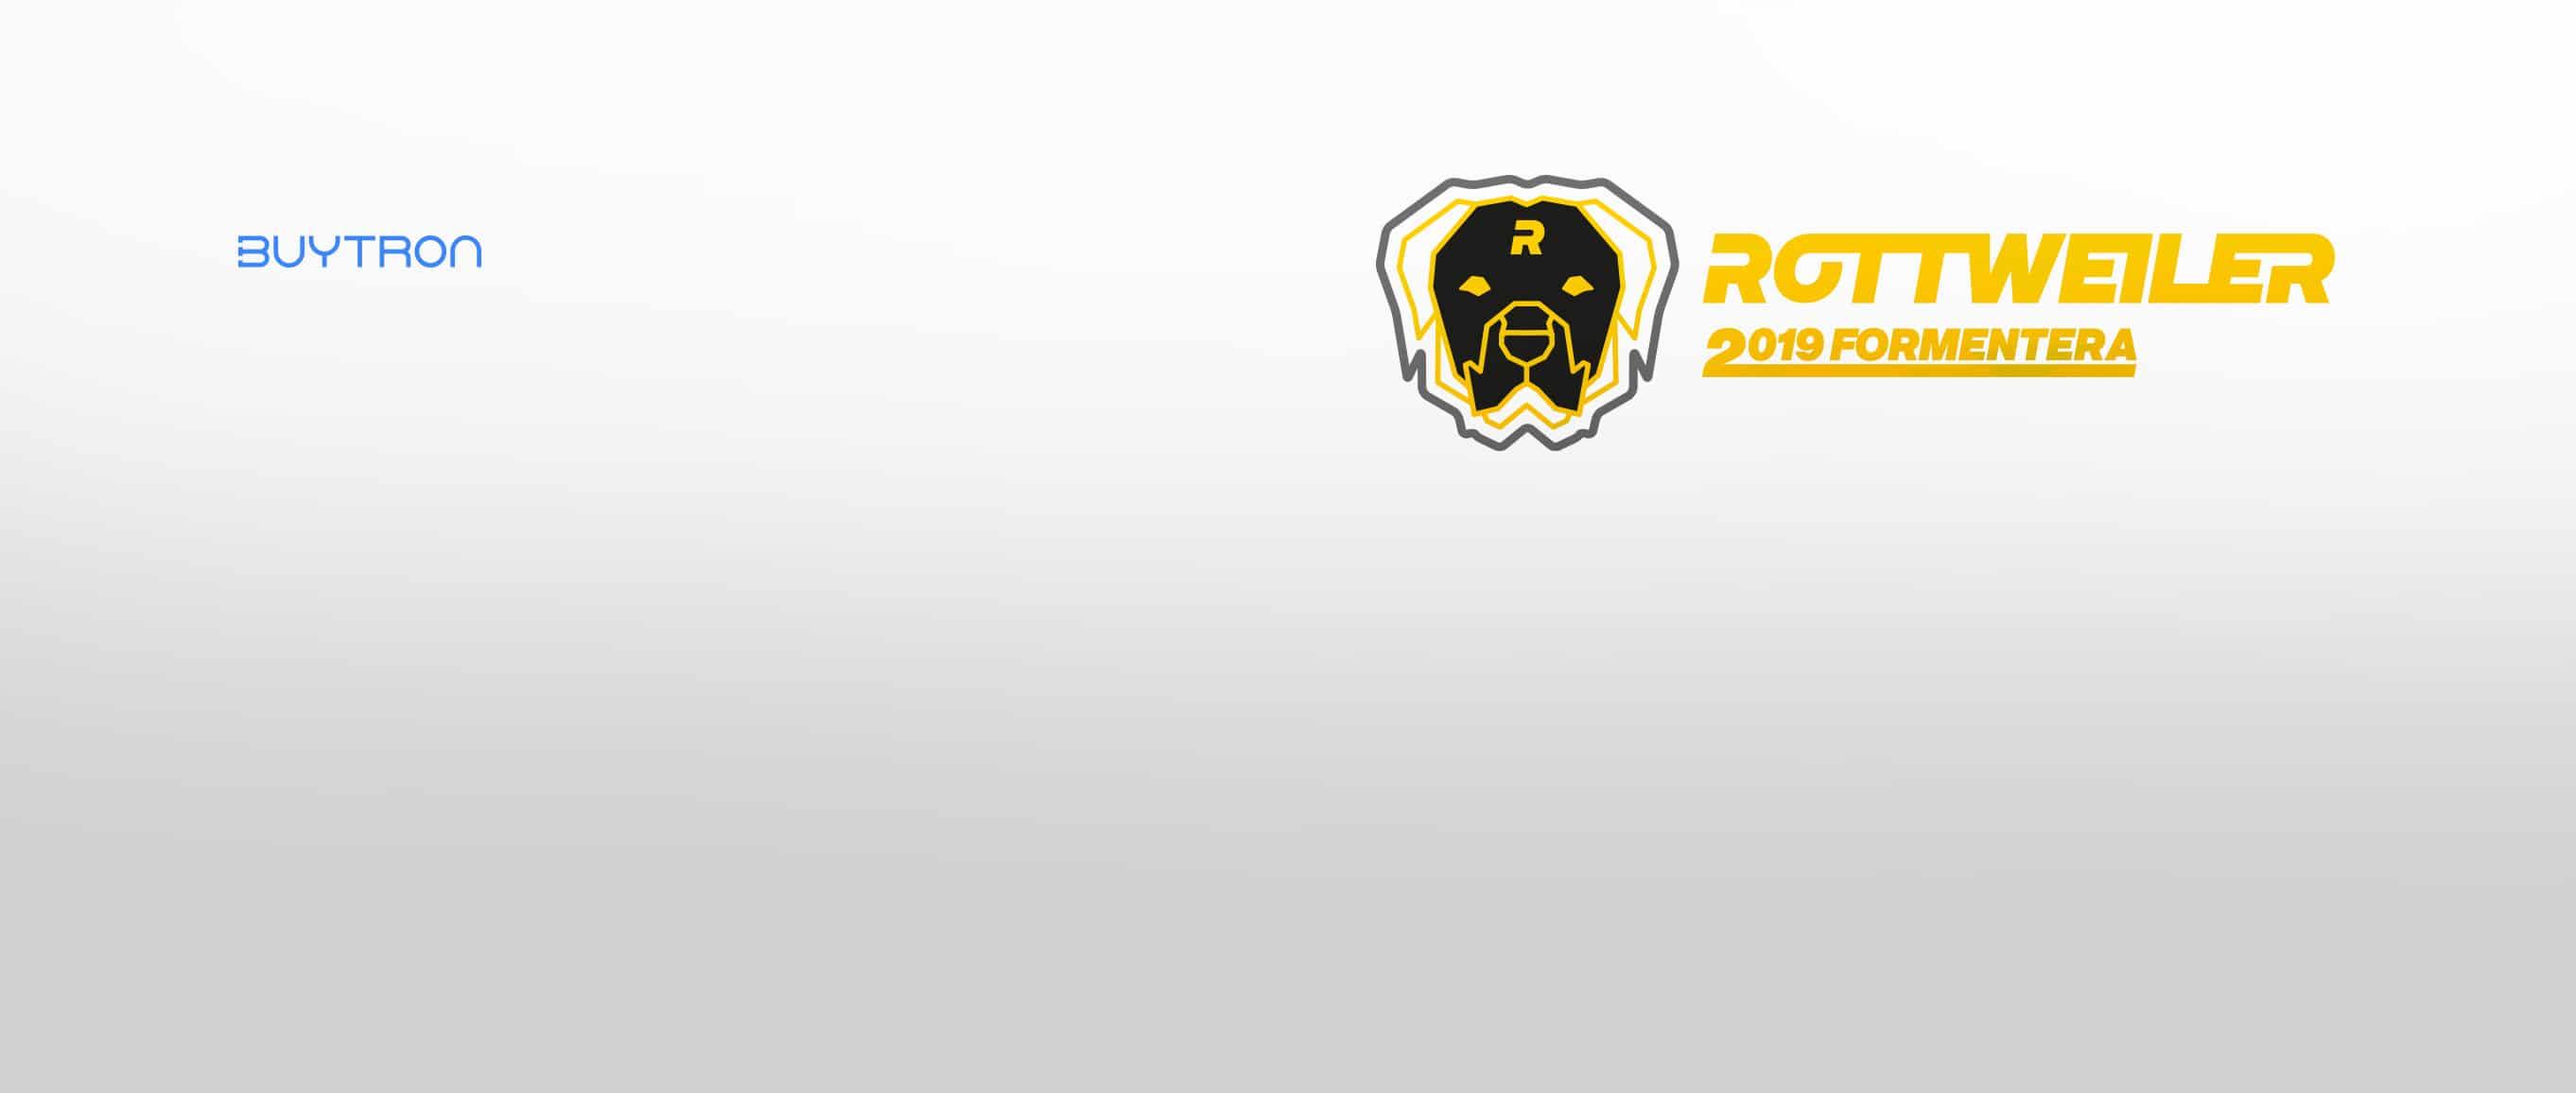 Buytron presenta Rottweiler 2019 al Tipic di Formentera